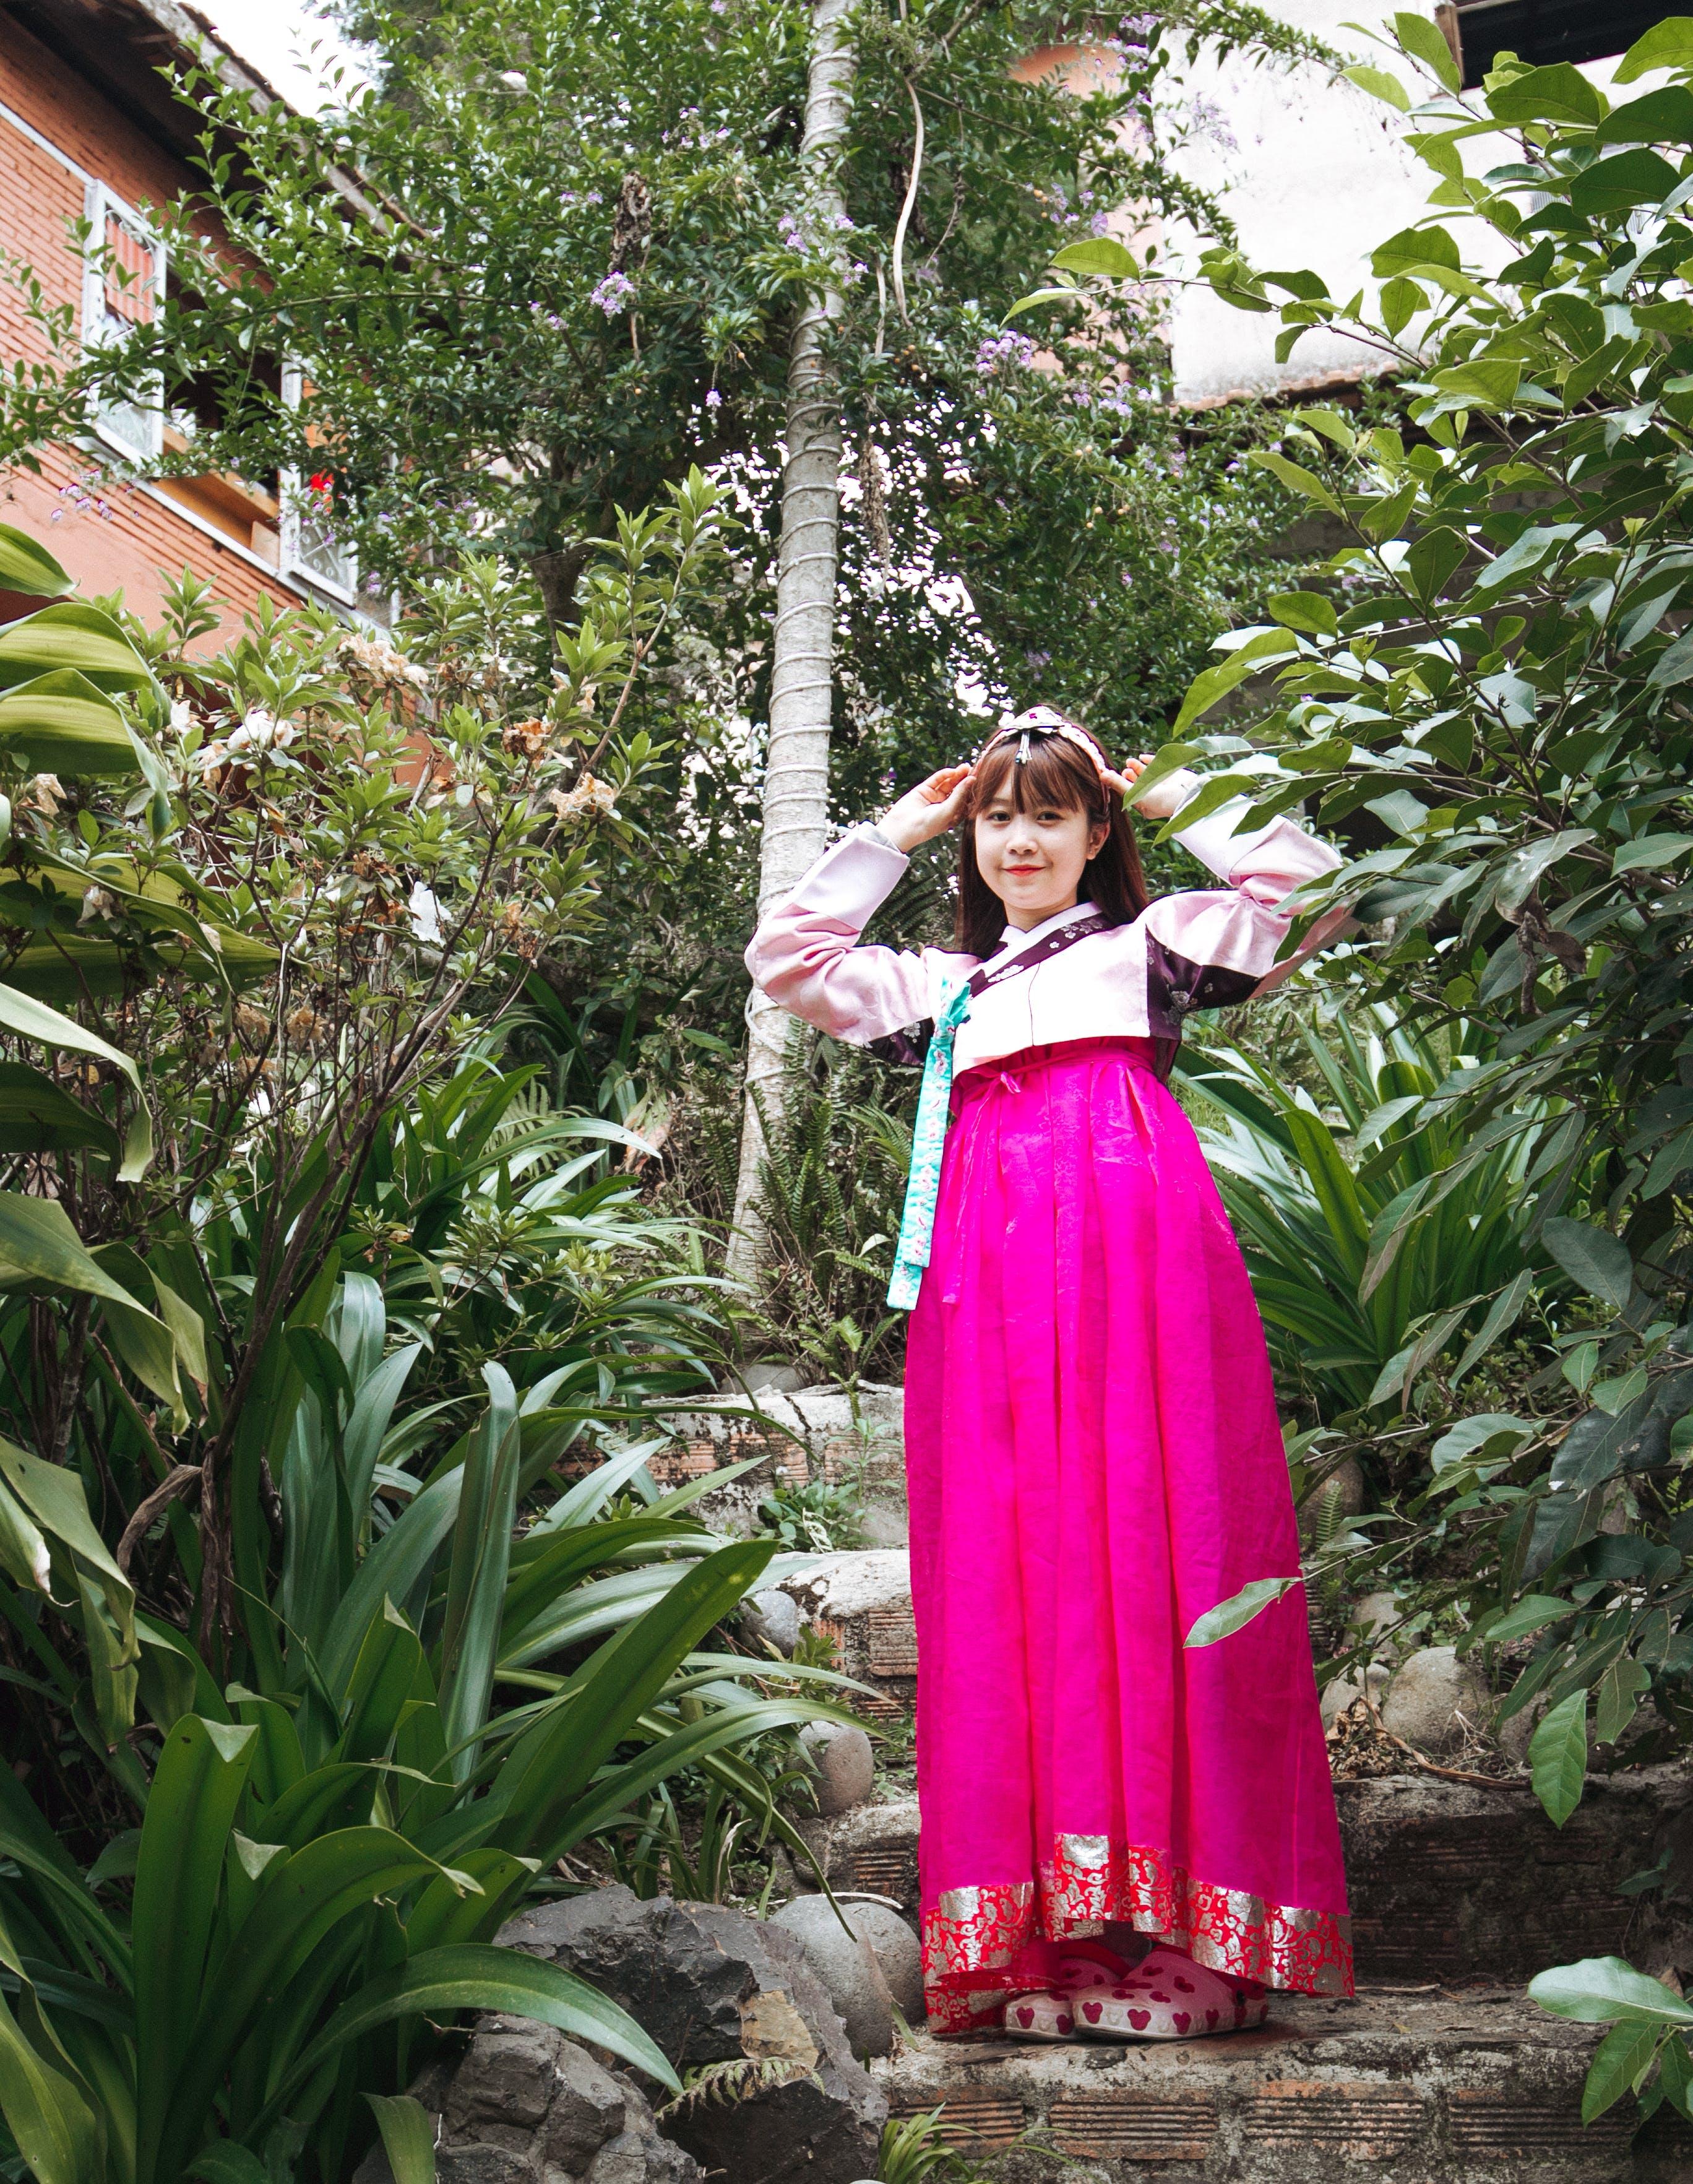 Woman Wearing Pink Long-sleeved Dress